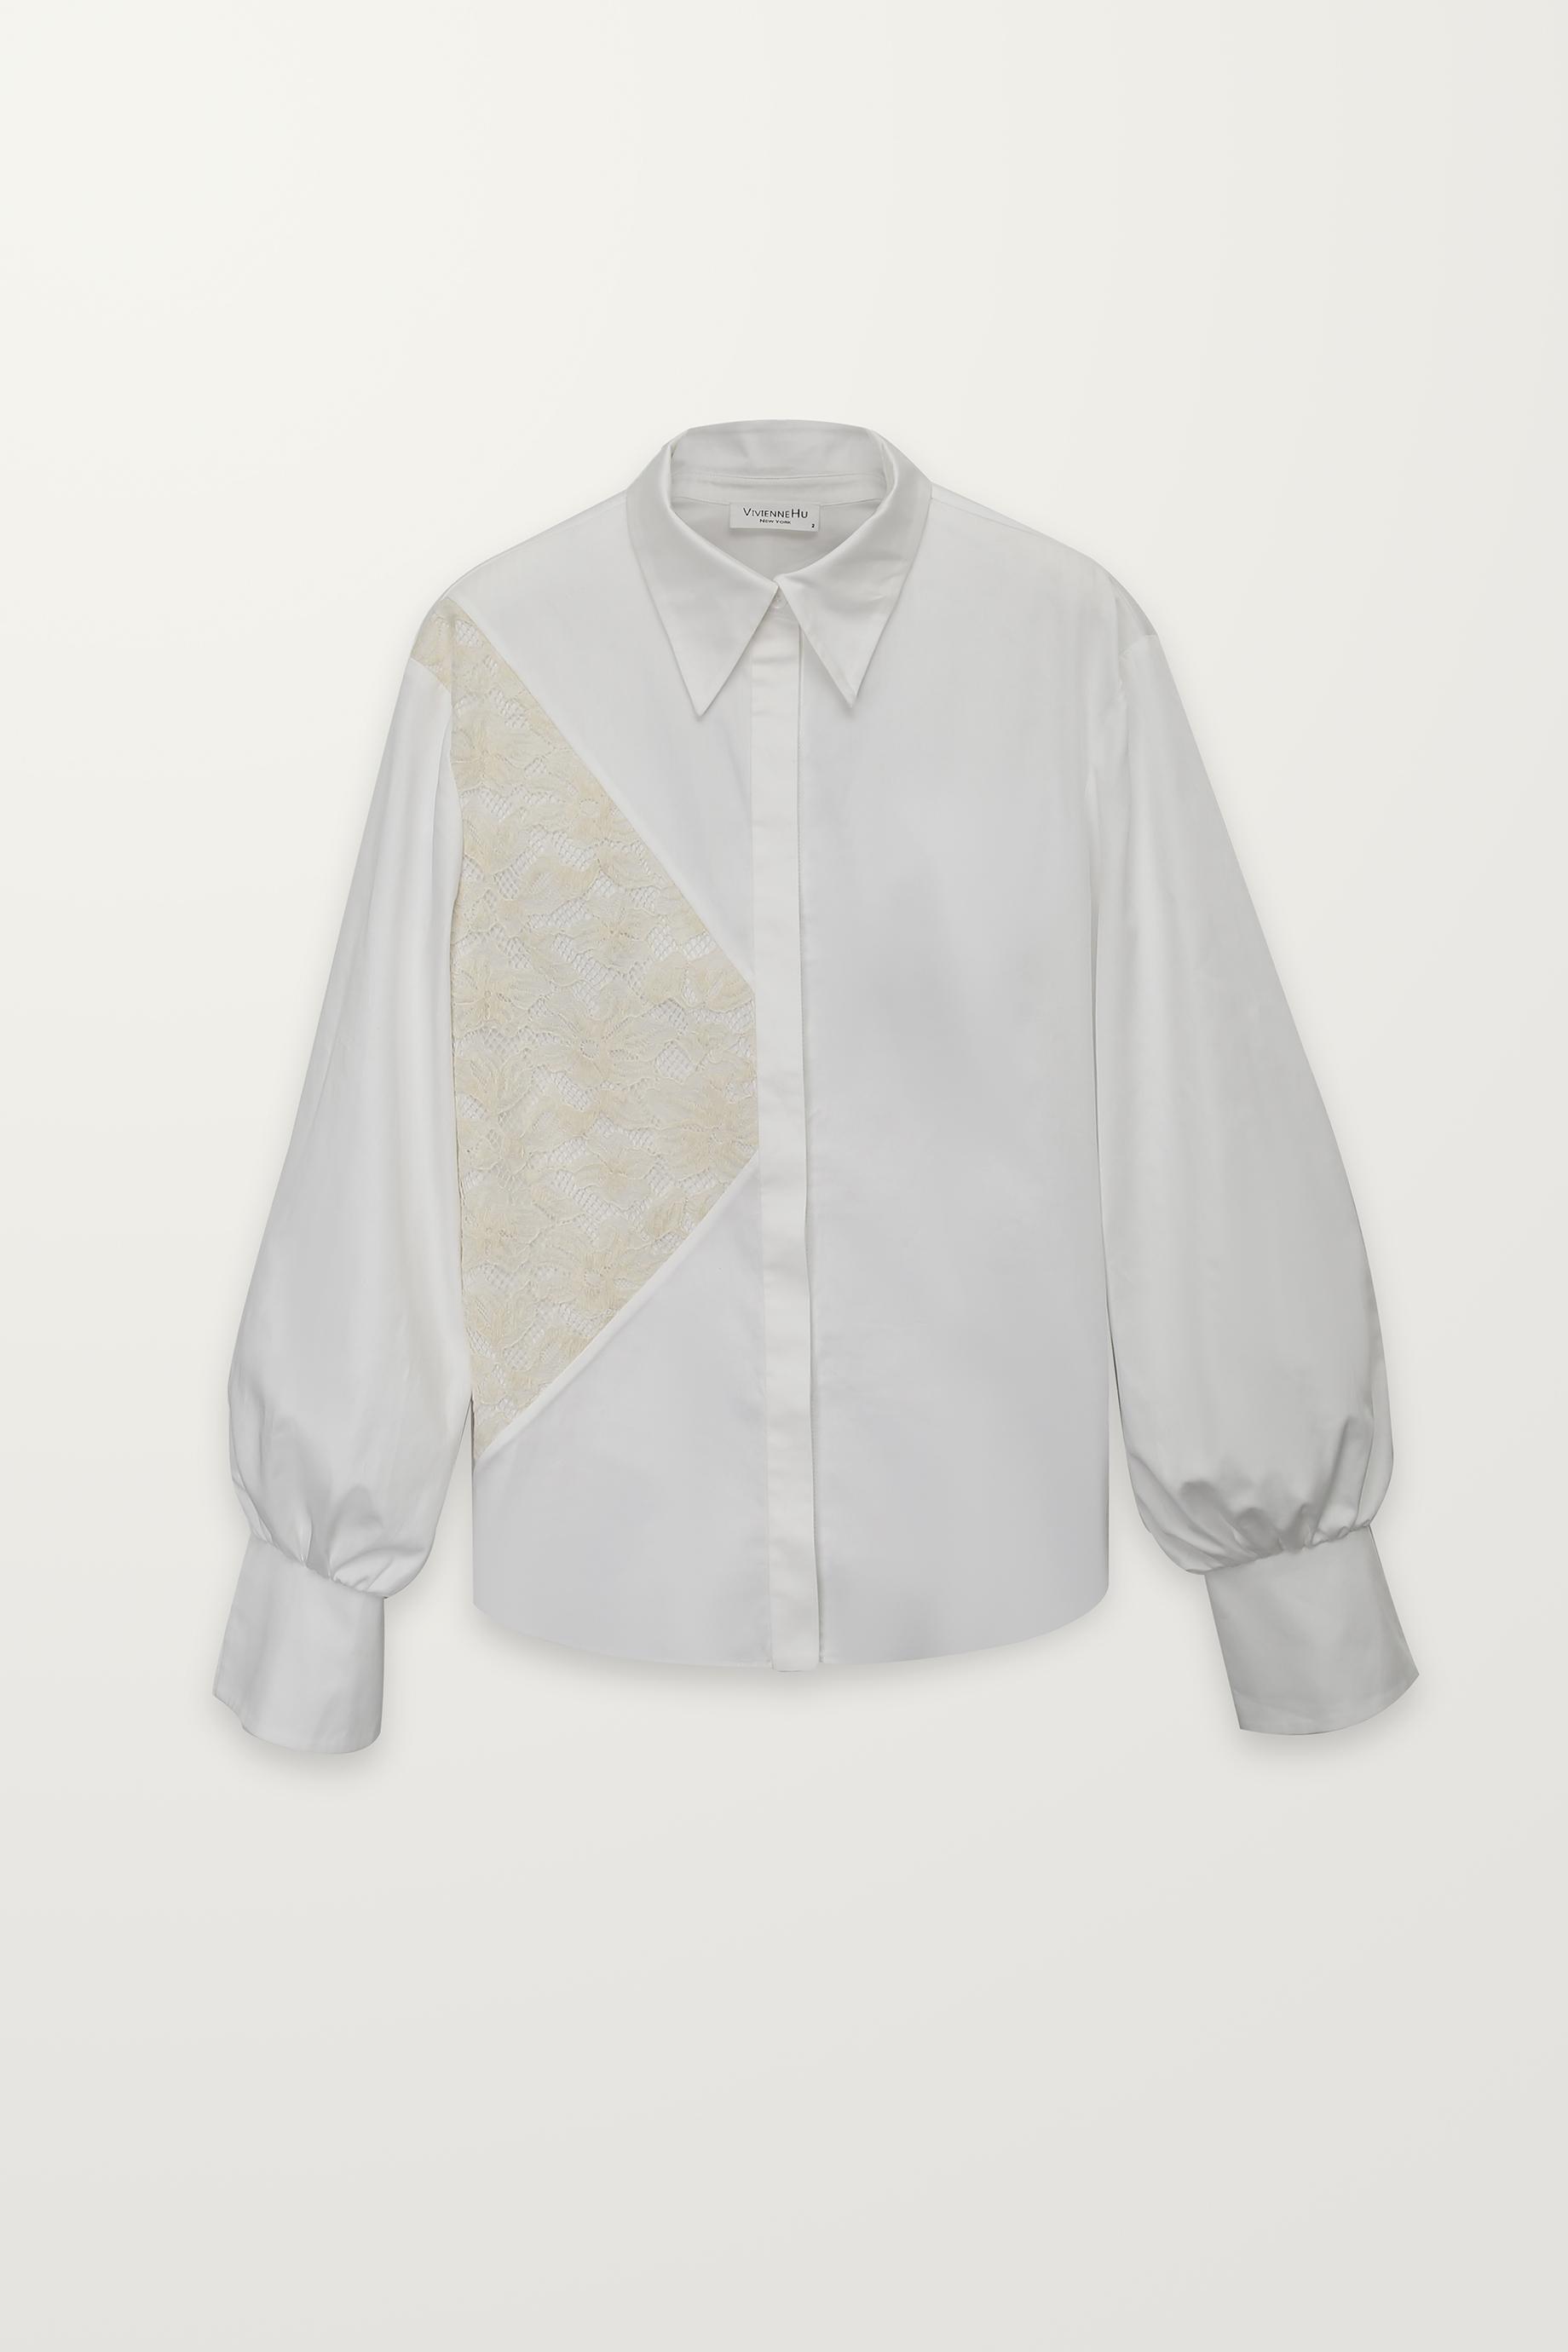 Triangle lace shirt